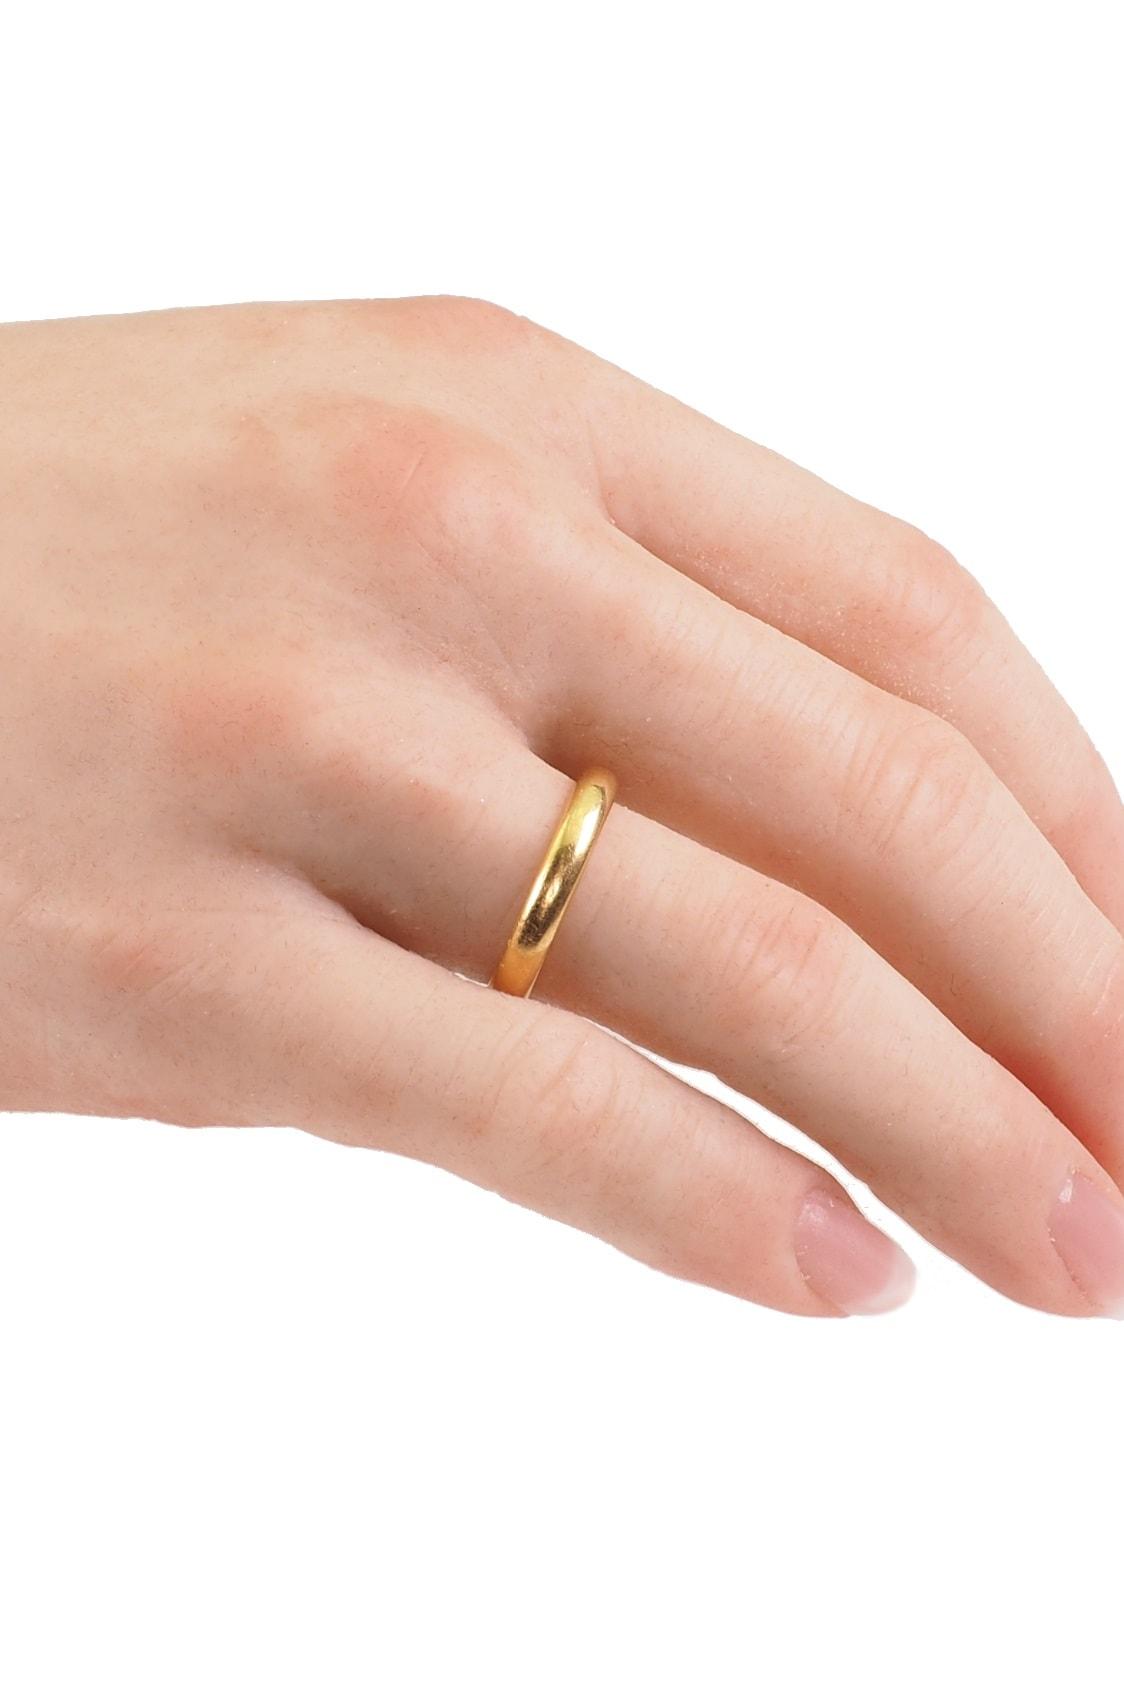 1731-Ringhand